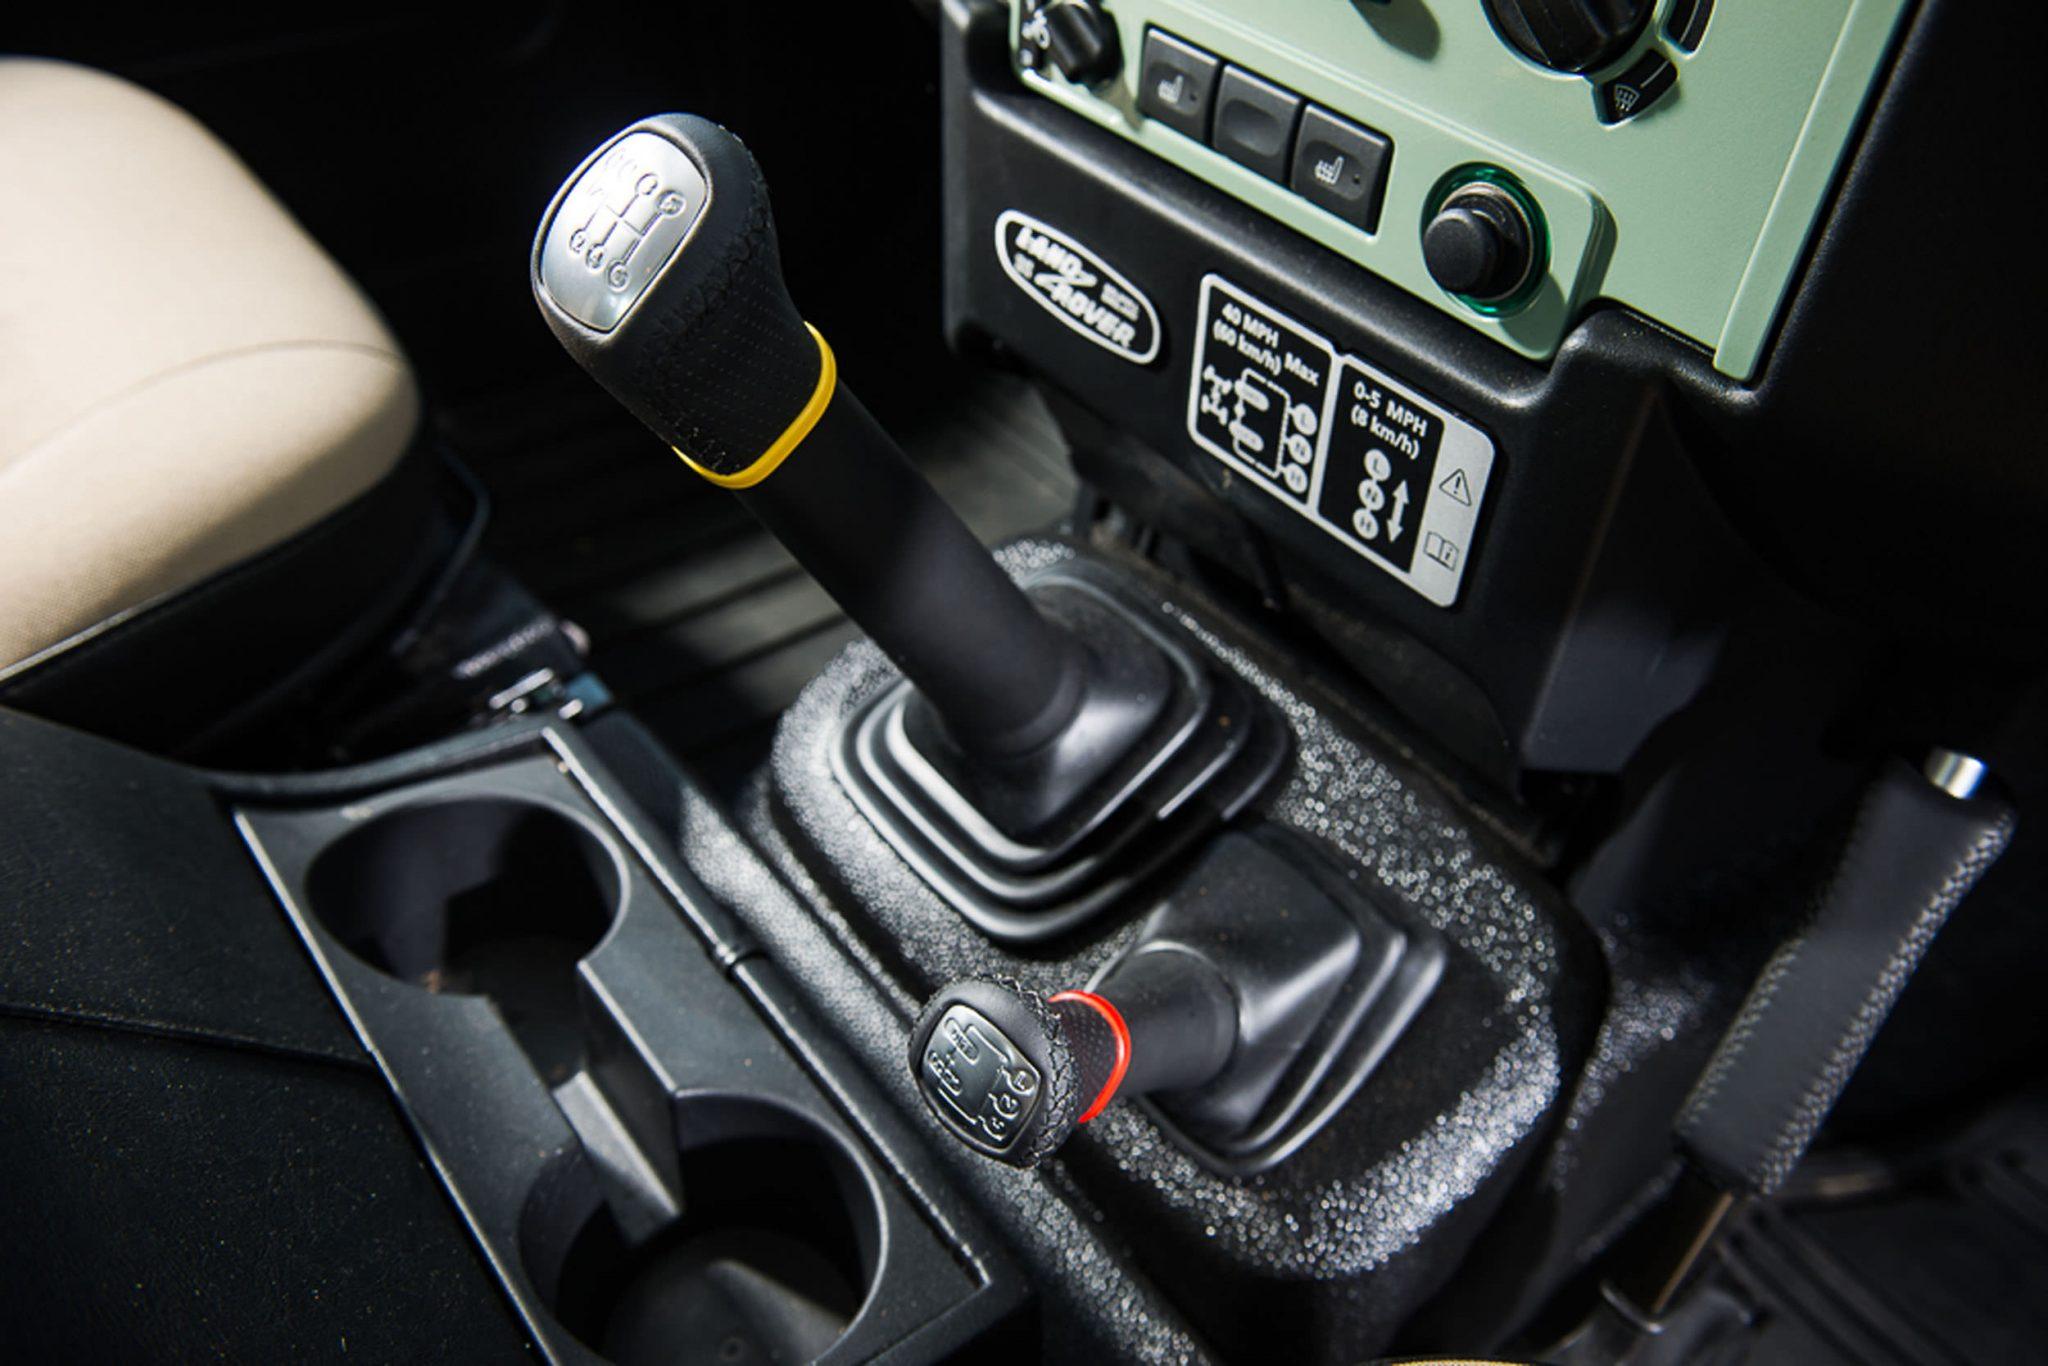 Rowan Atkinson's Land Rover Defender 6 - Rowan Atkinson's Land Rover Defender